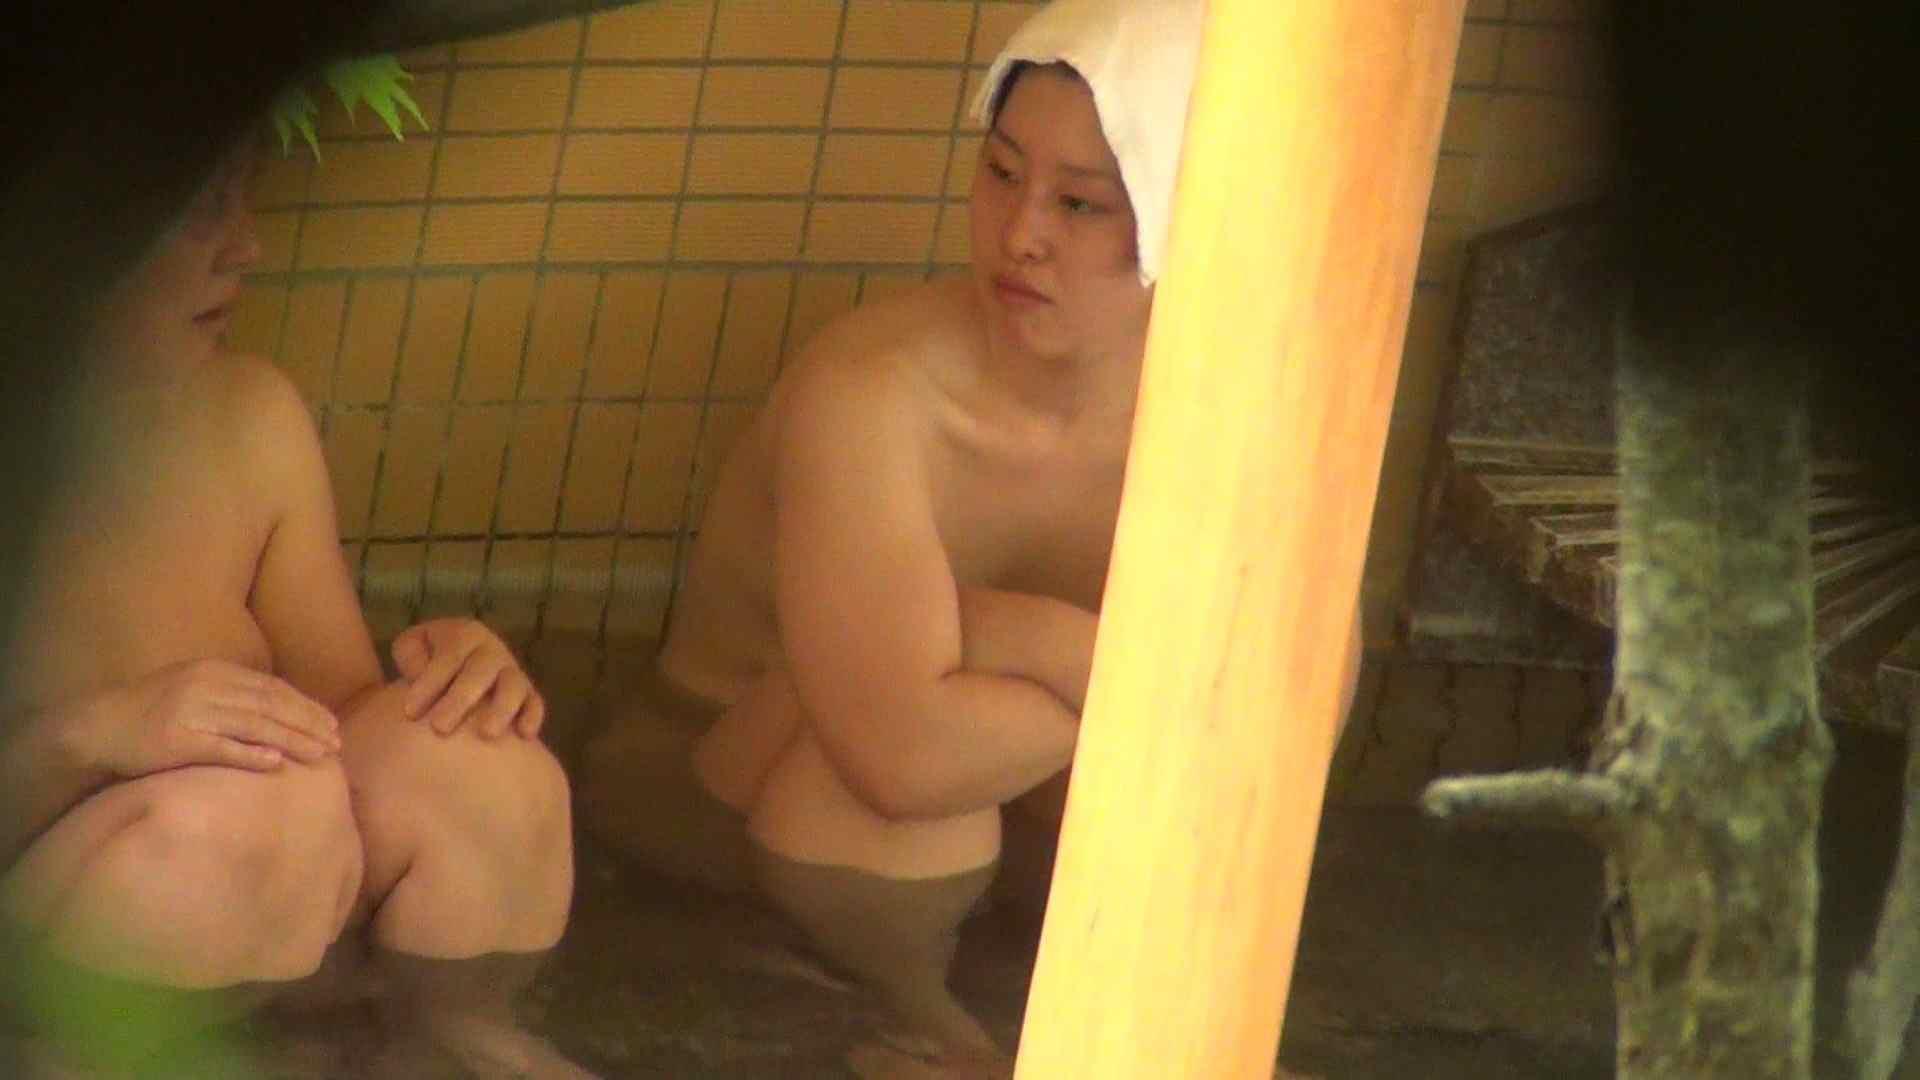 Aquaな露天風呂Vol.264 盗撮大放出 ぱこり動画紹介 100連発 99